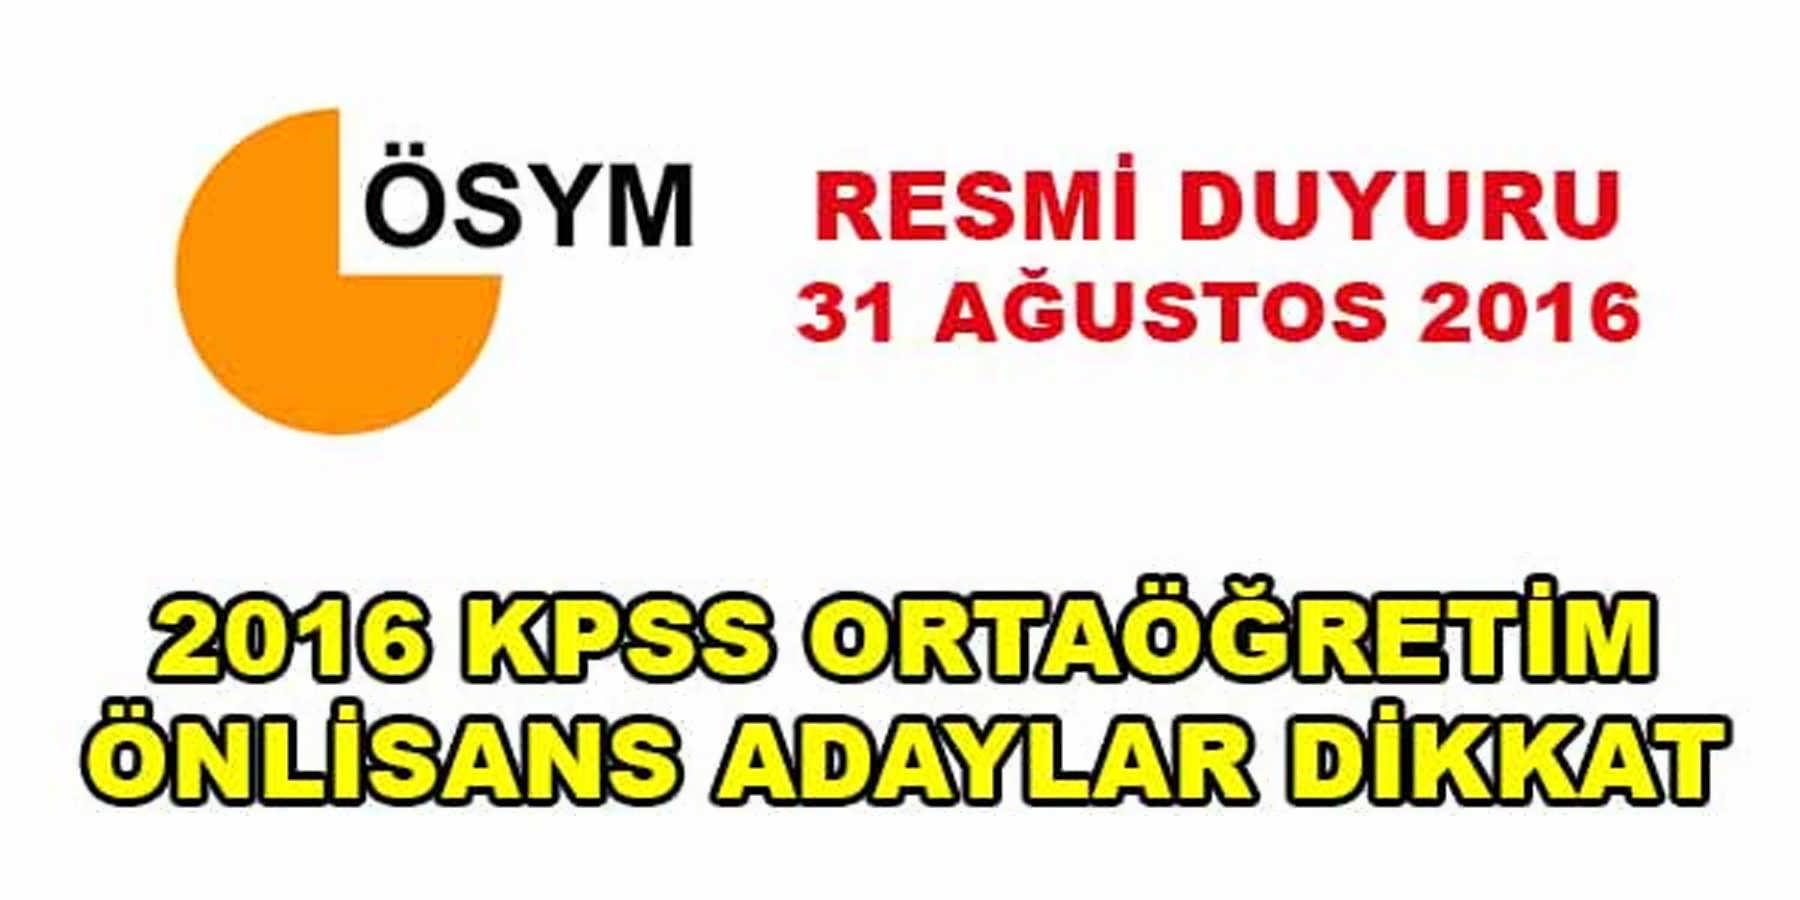 ÖSYM KPSS 2016 Resmi Duyurusu